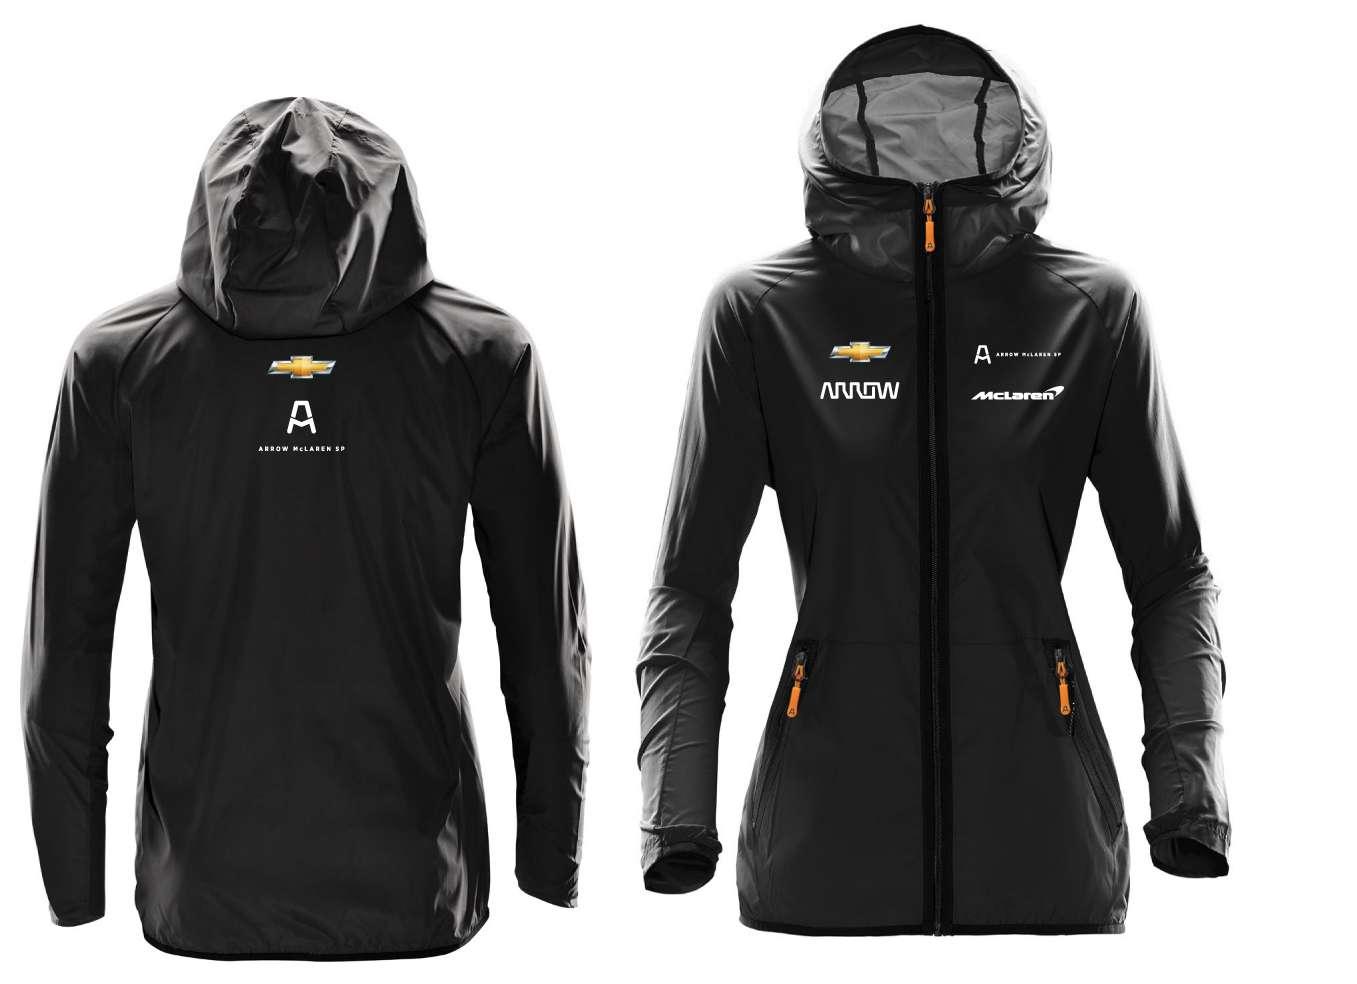 MEDIUM Women's Official Team Rain Jacket